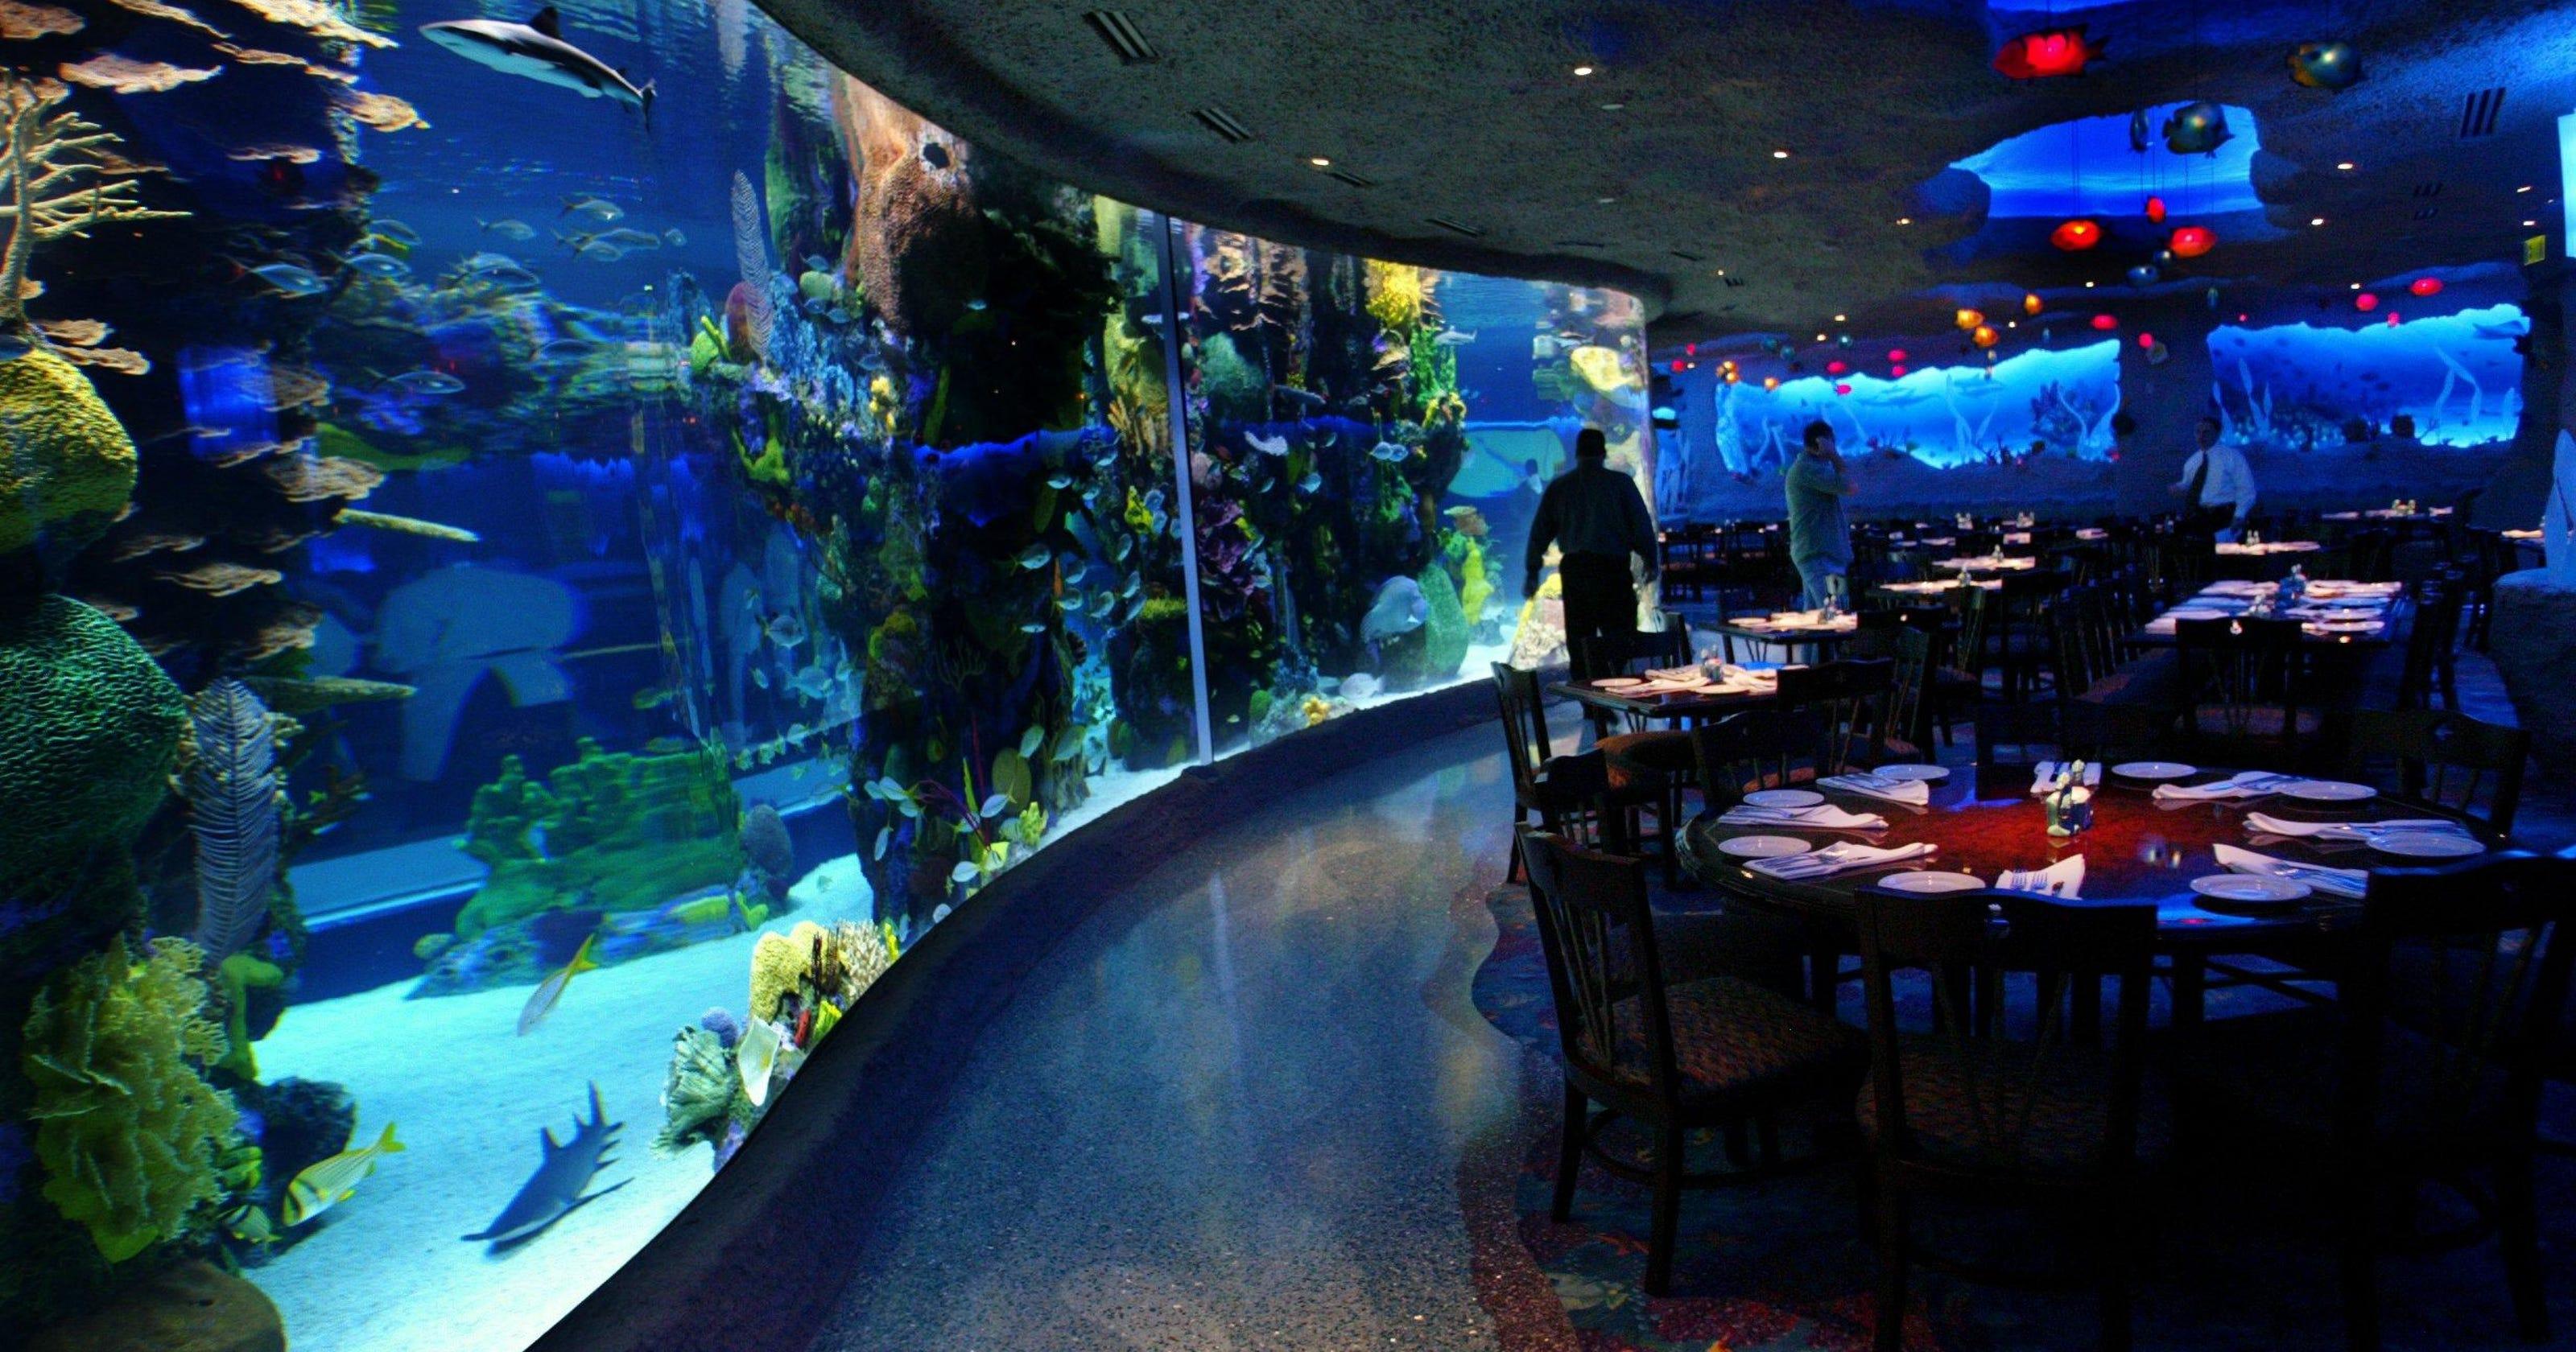 Kristen Kindoll: Aquarium staffers bond with animals